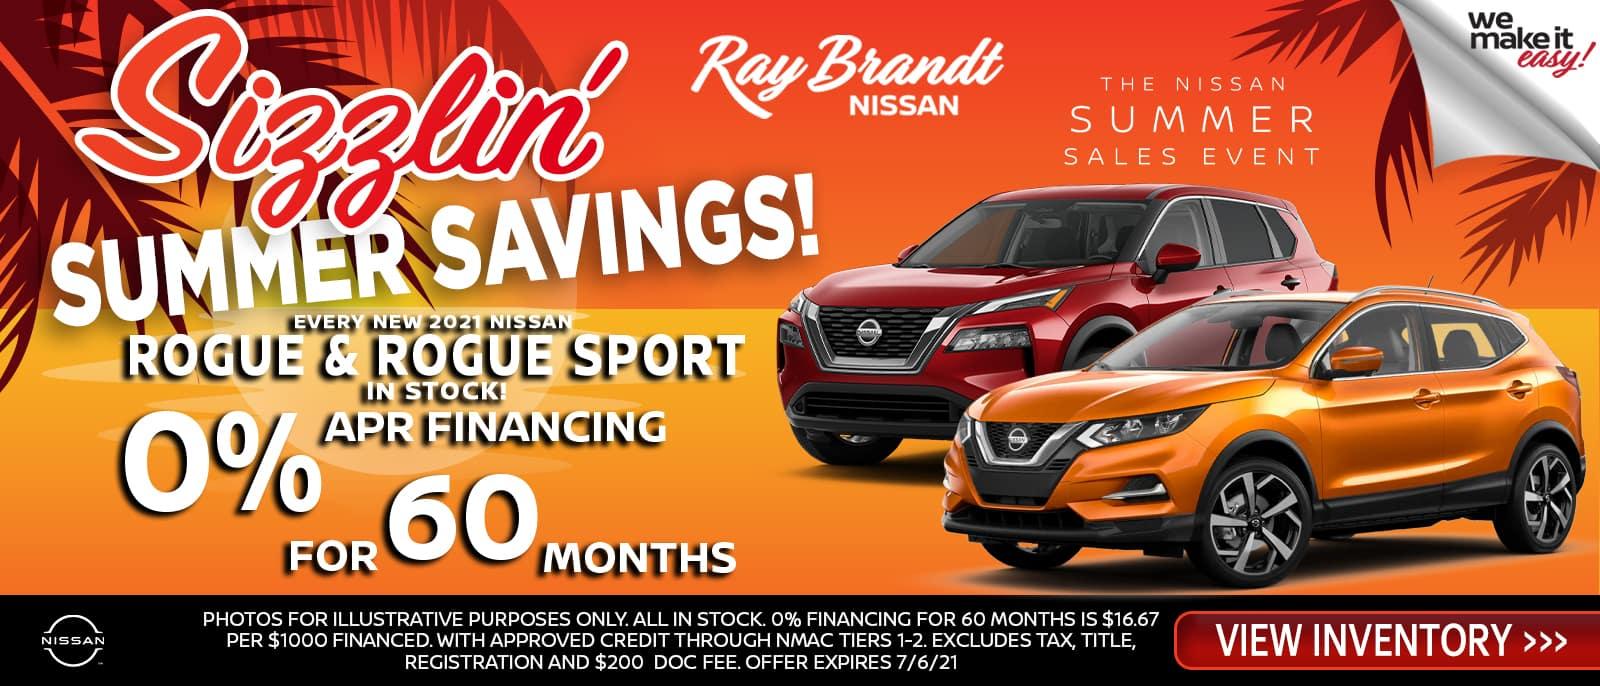 Nissan Rogue, Rogue Sport, Midsize SUV, sale